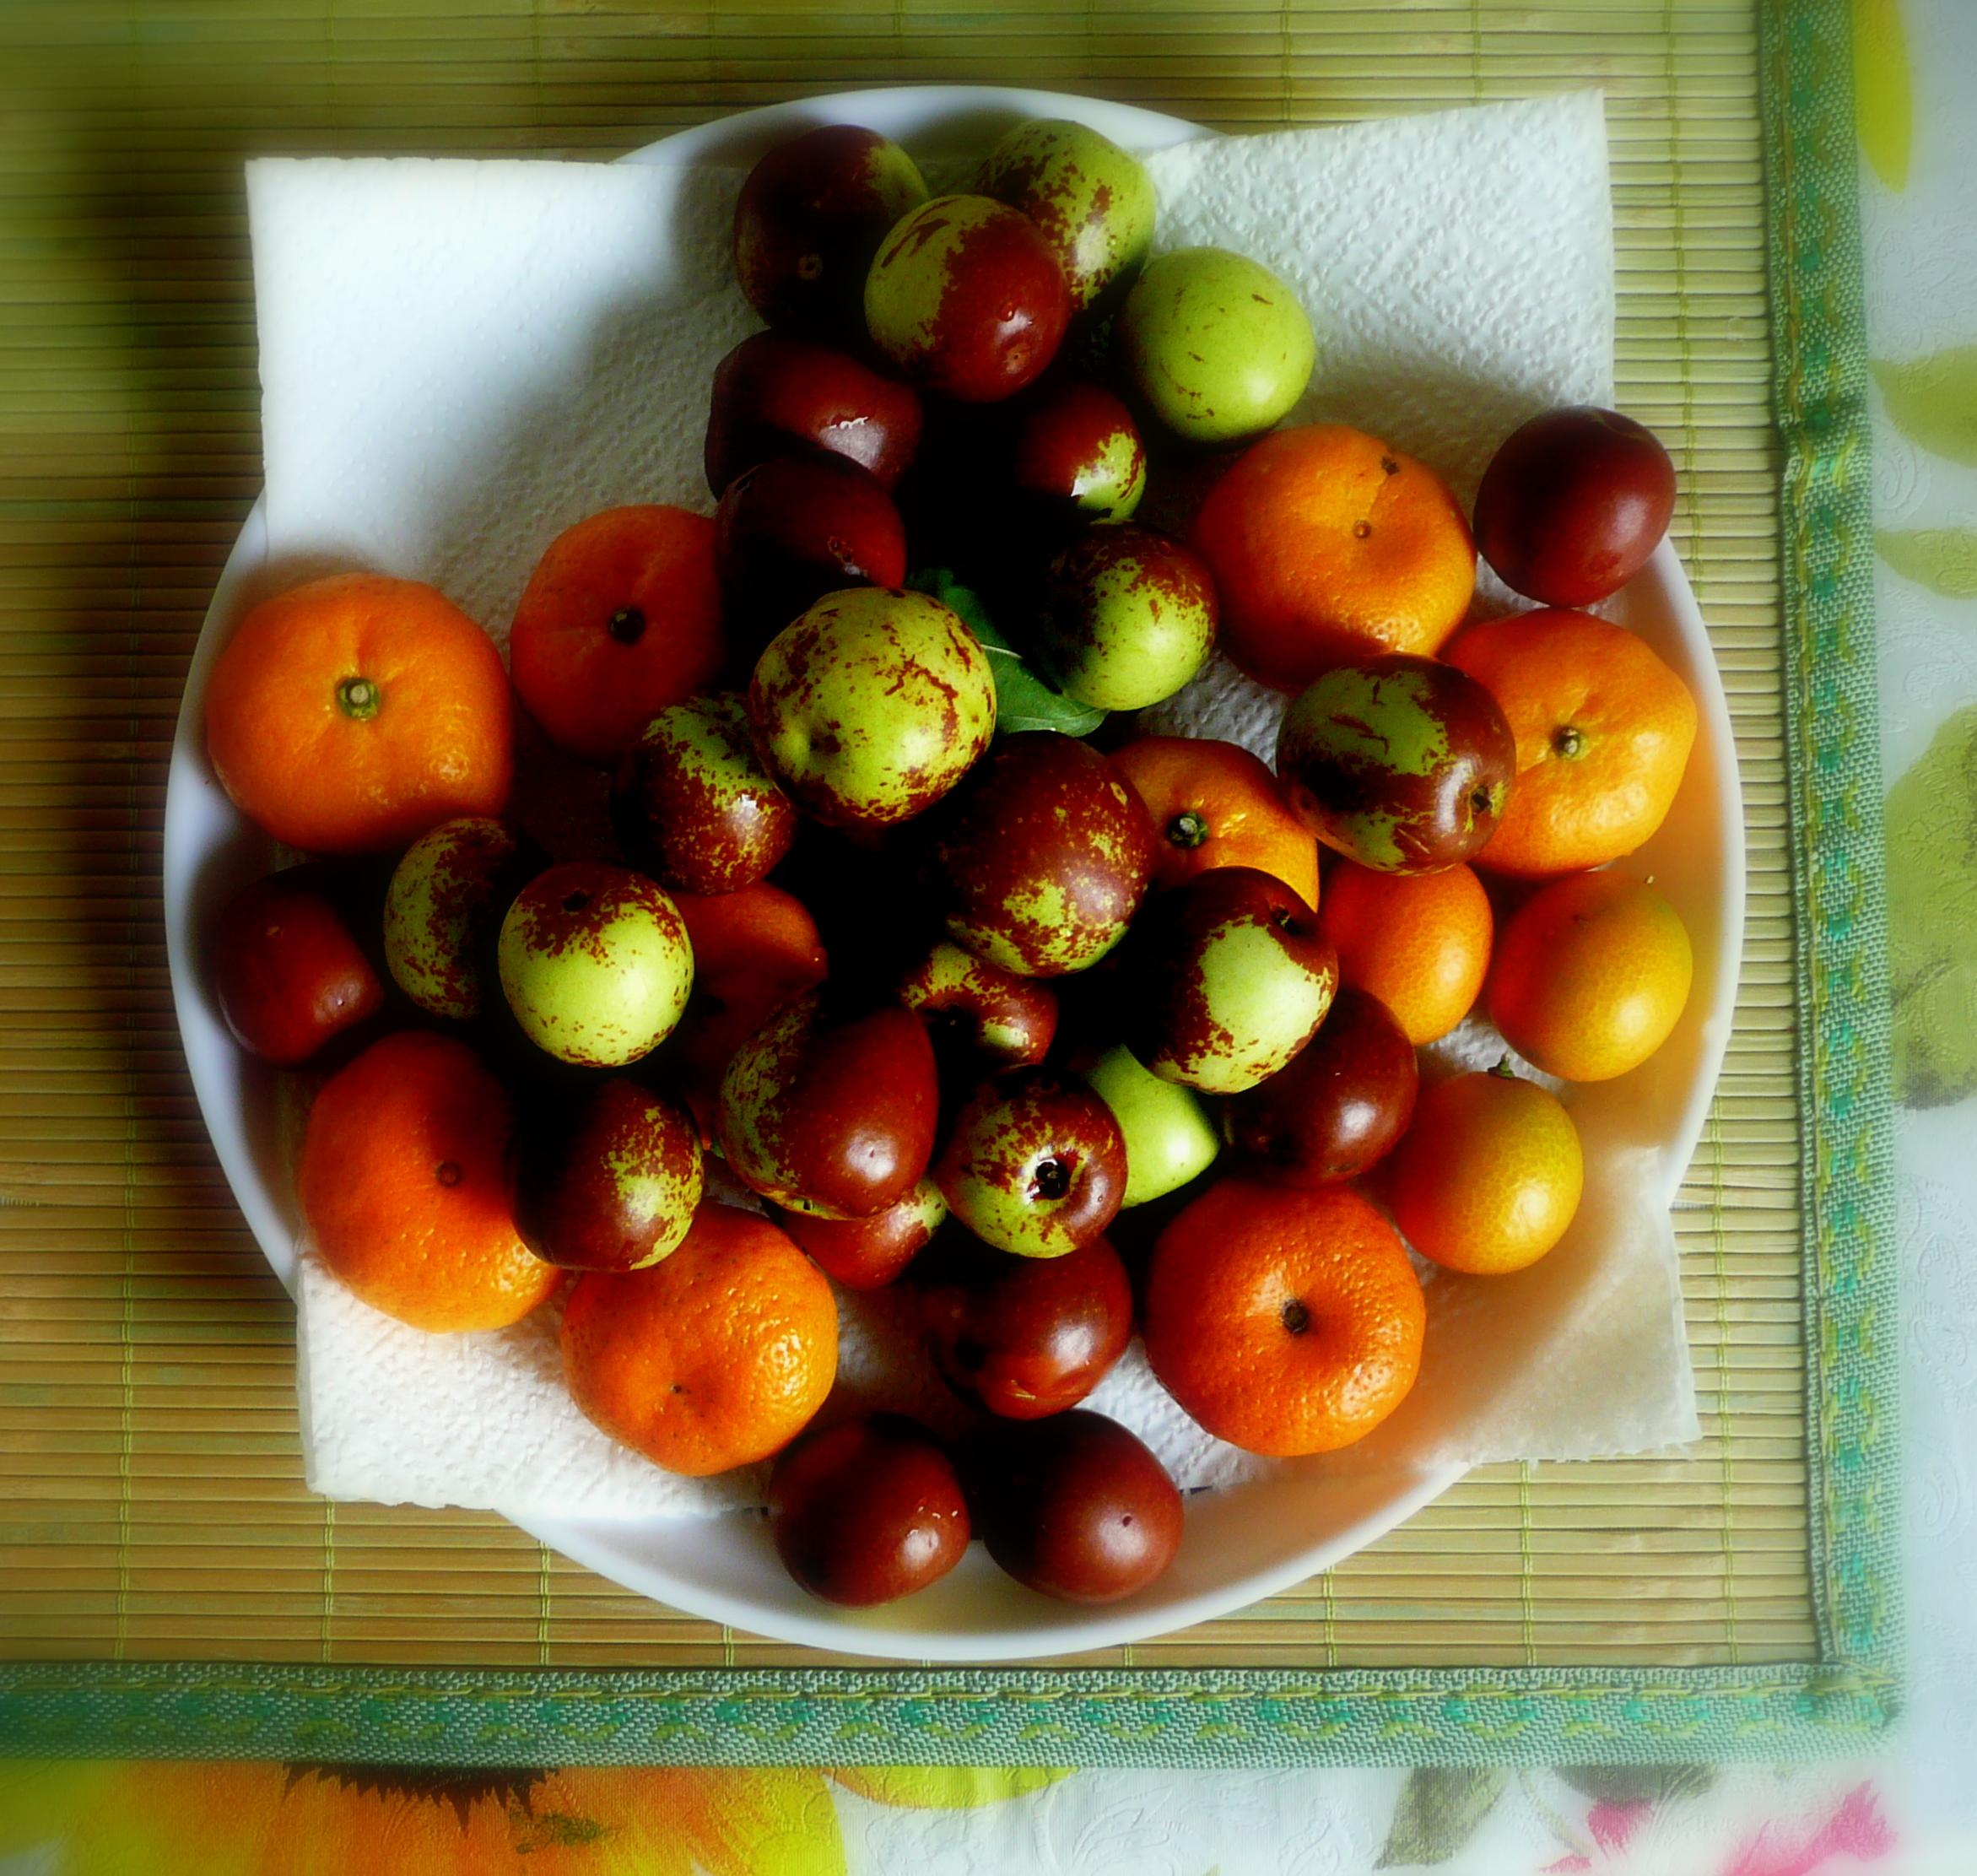 mandarin oranges and jujube